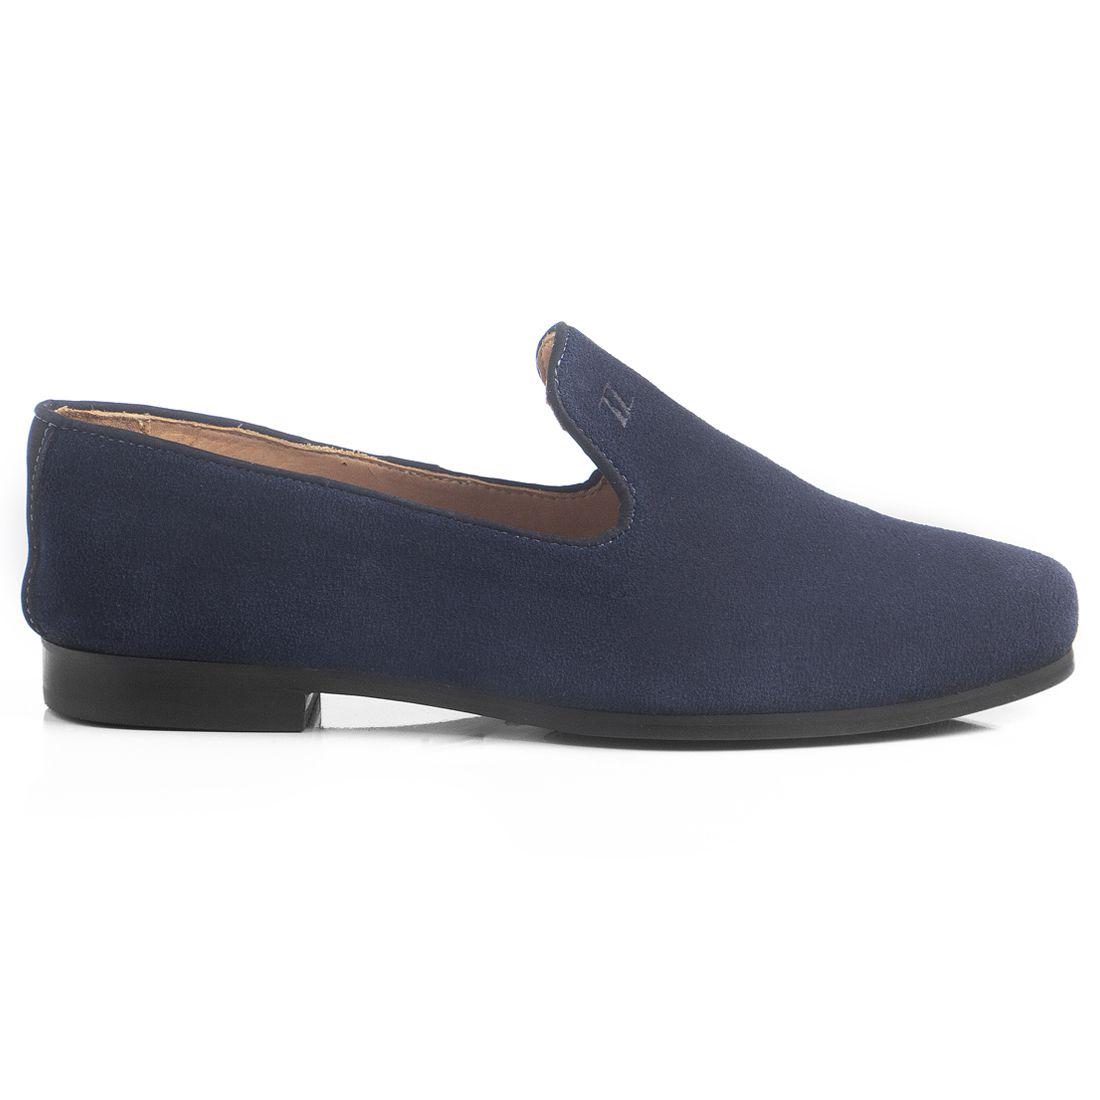 Loafer Masculino em Couro Camurça Azul Marinho Rocco Lorenzzo - 4499